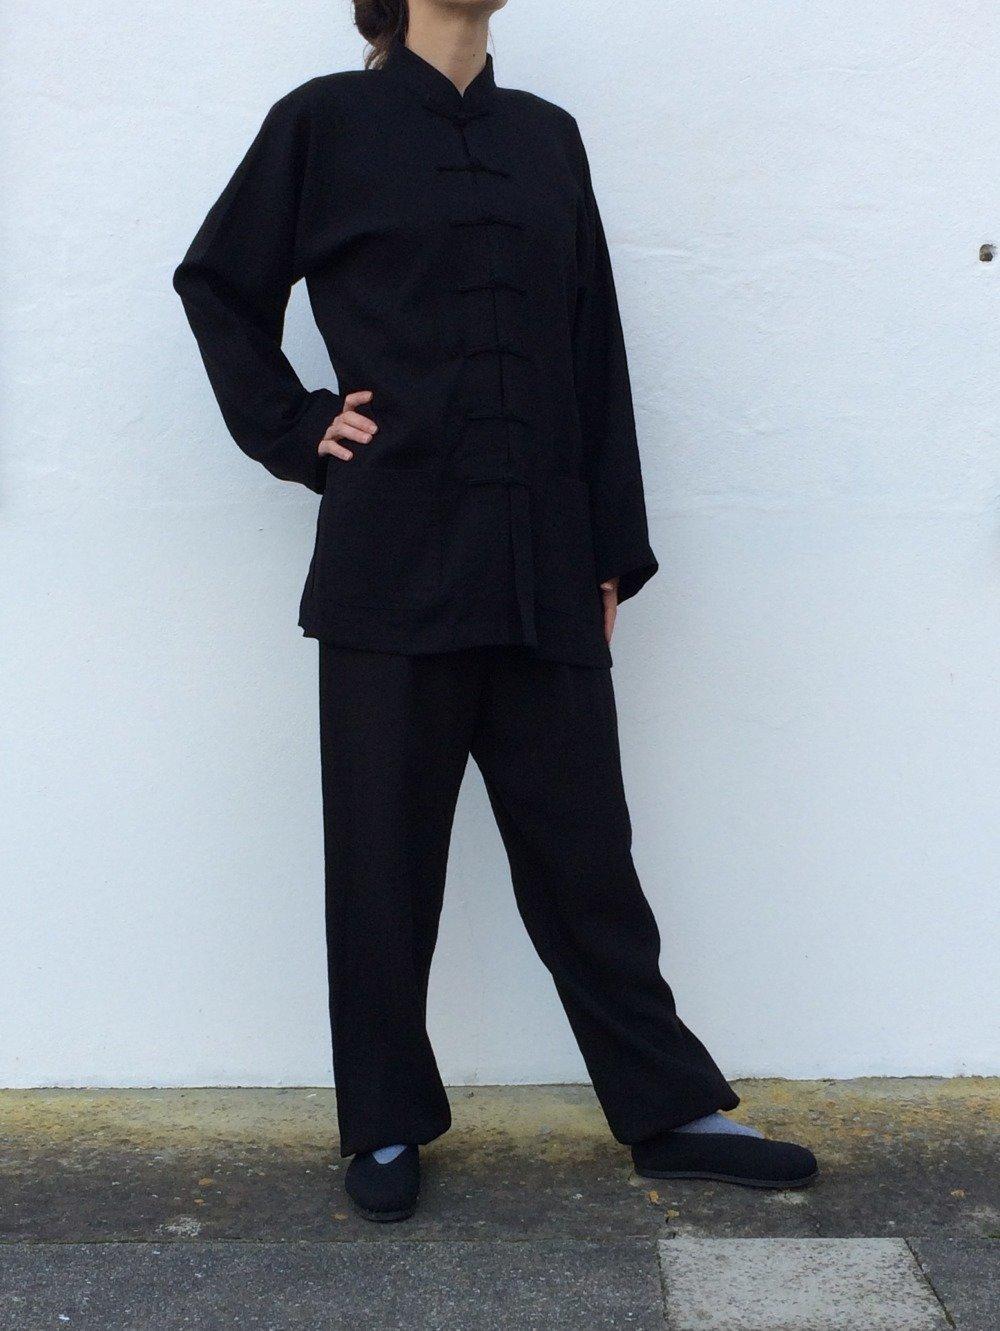 Vêtements Tai Chi Chuan, Qi Gong, Kung Fu, ensemble noir, mixte